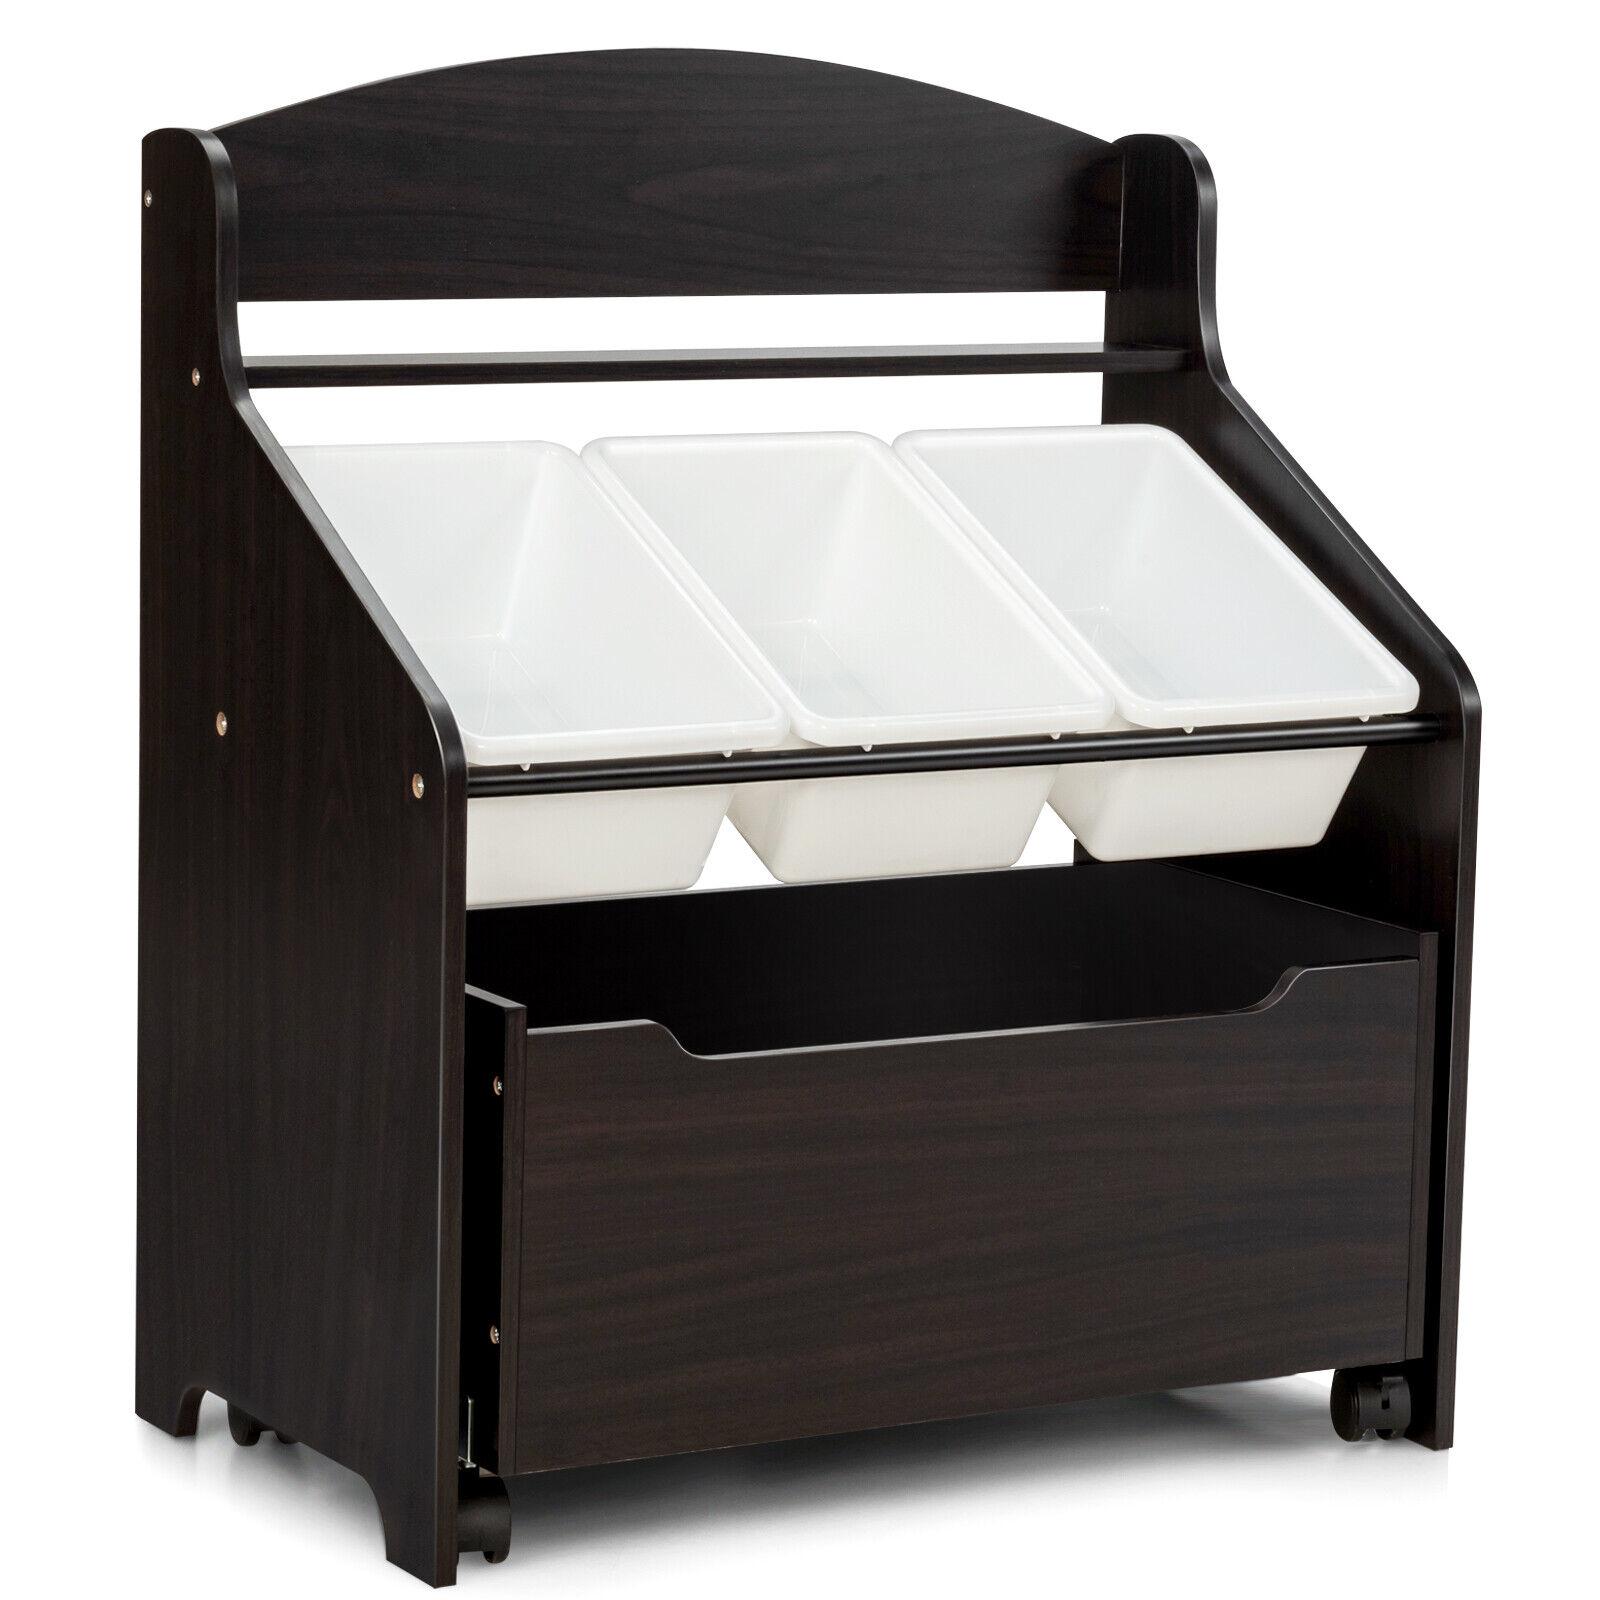 Kids Storage Bench W Cushion 3 Bins Organizer Toys Durable Hallway Entry For Sale Online Ebay